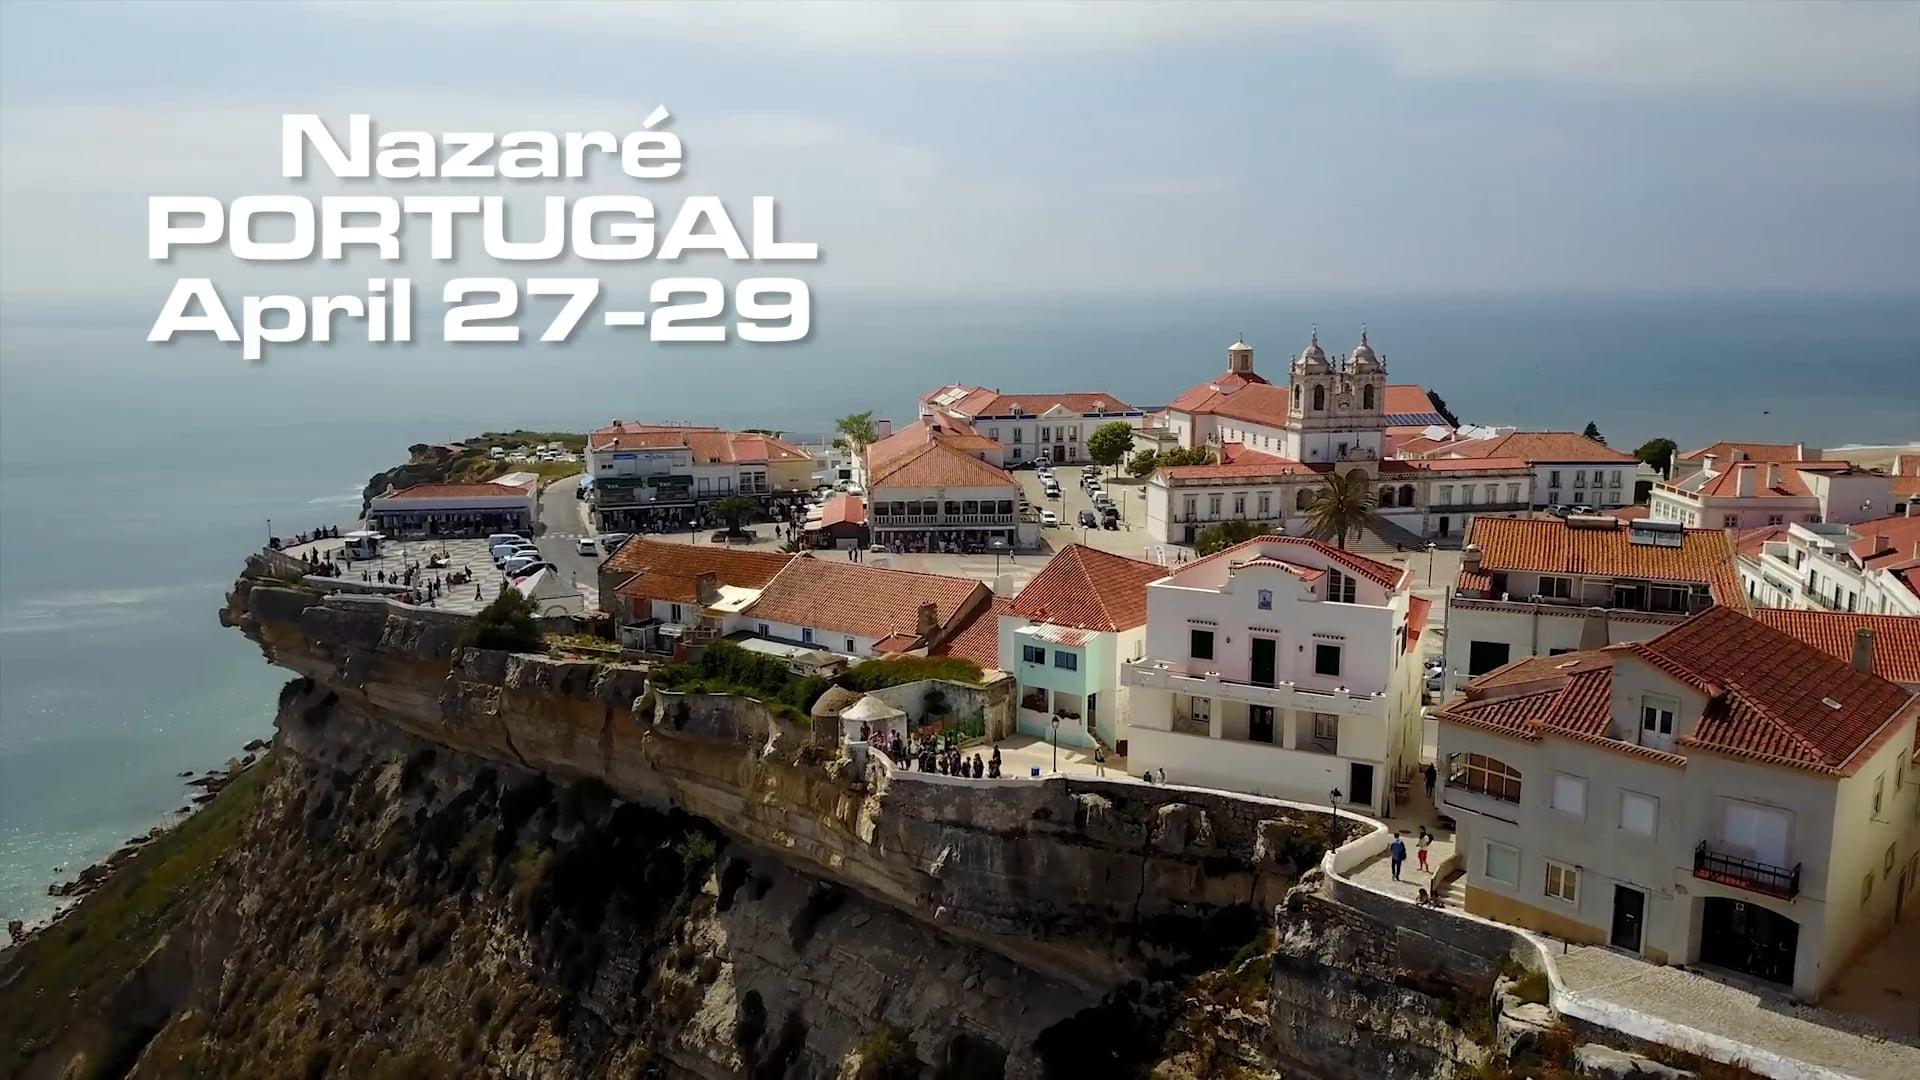 IFWA 2018 Freeride World Tour Stop 1: Nazaré, Portugal - April 27-29th